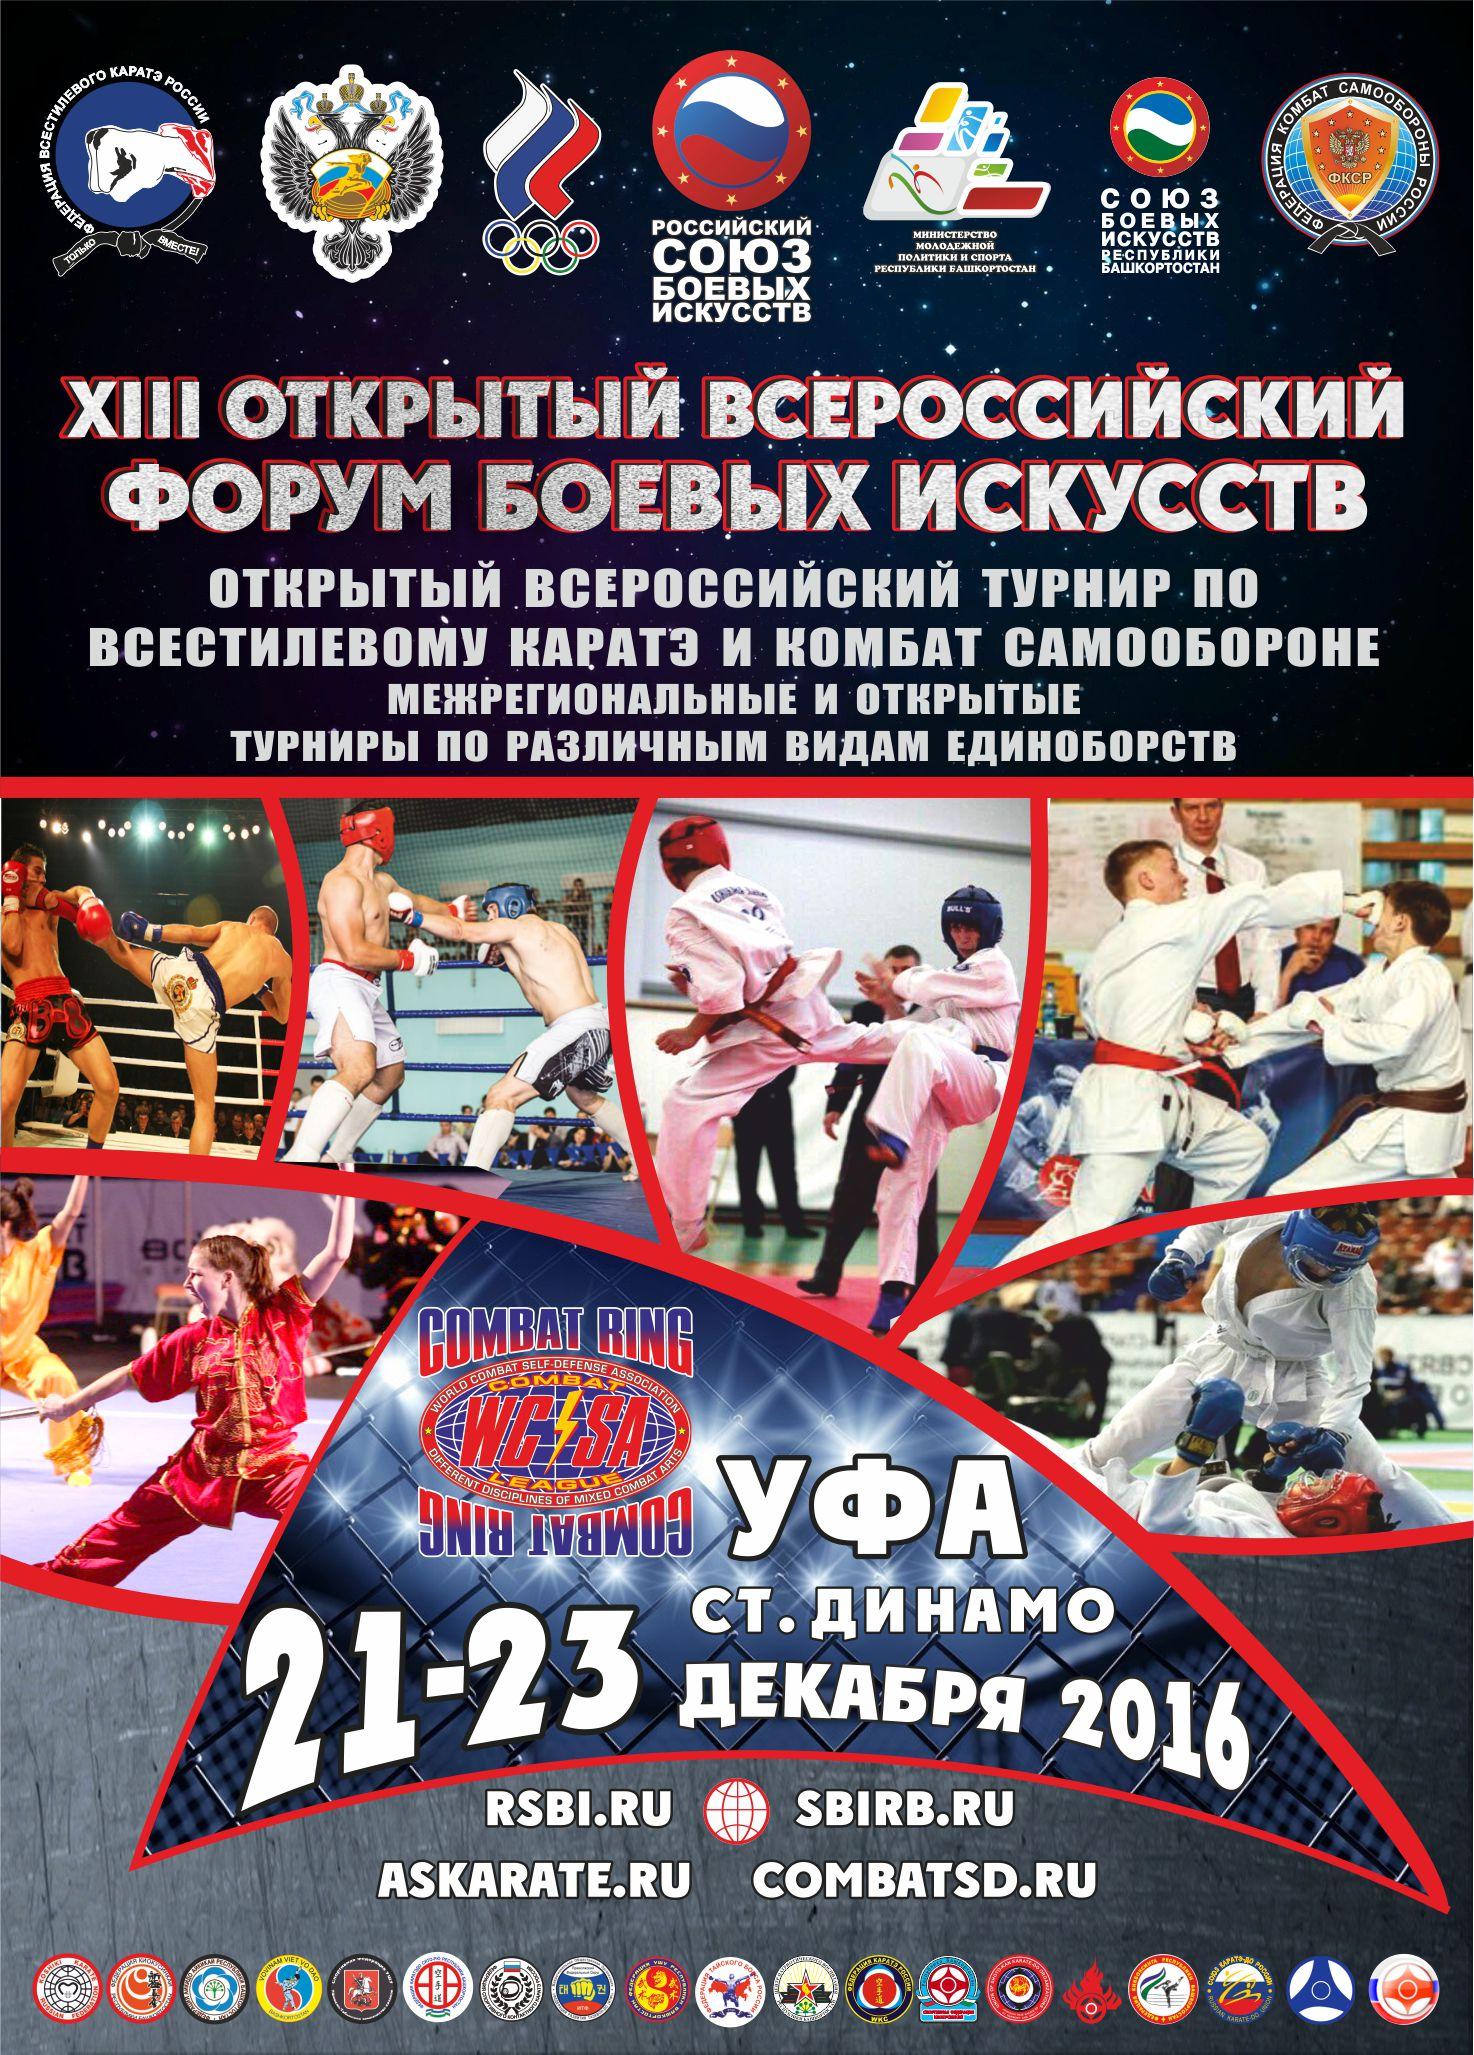 http://combatsd.ru/images/upload/АфишаА3(2).jpg